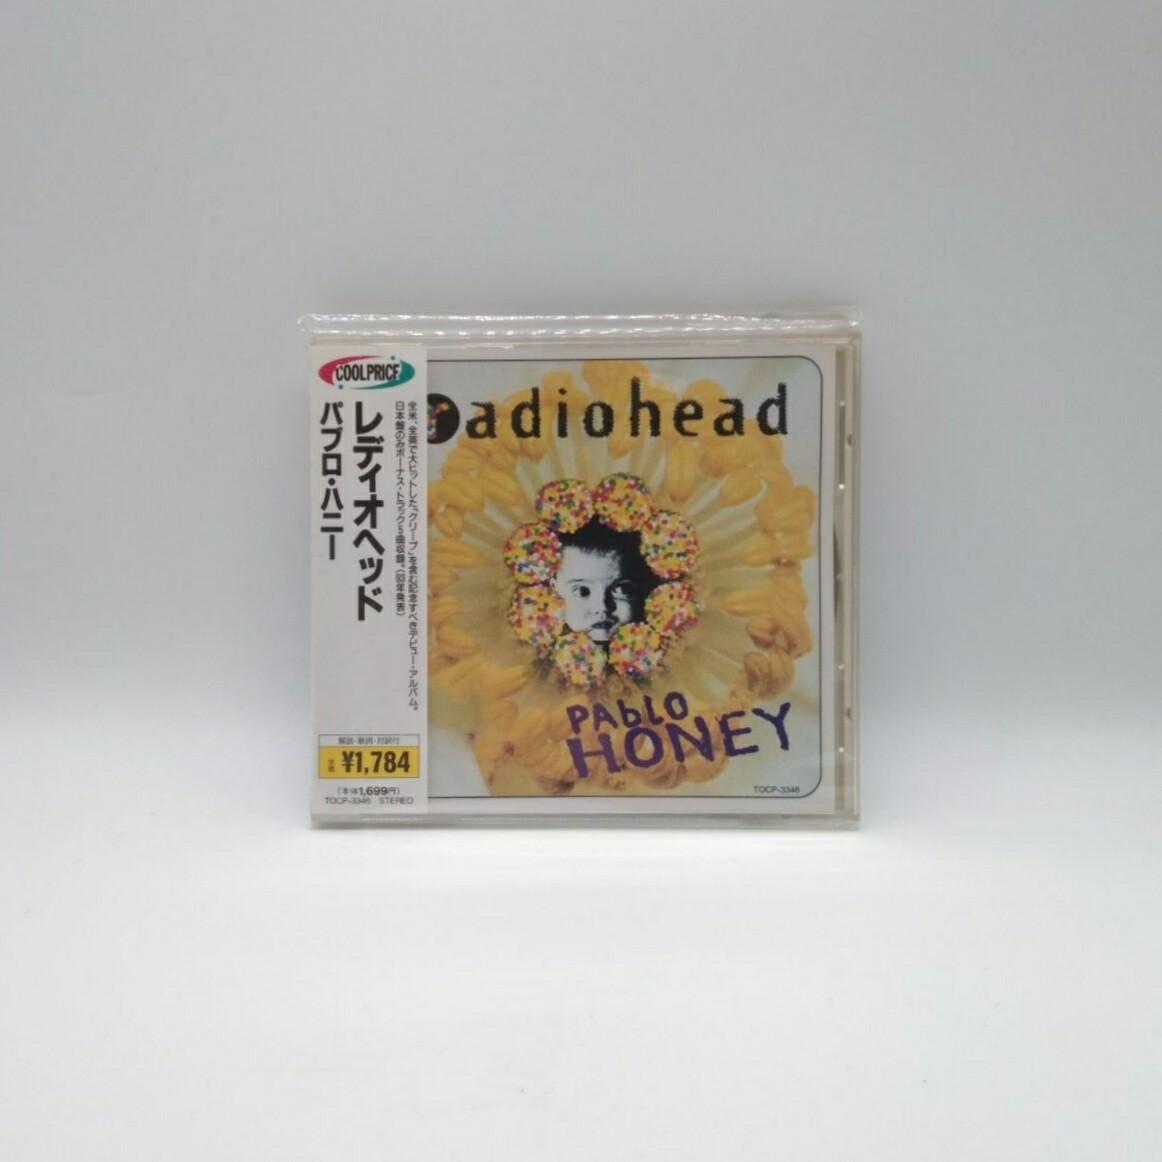 [USED] RADIOHEAD -PABLO HONEY- CD (JAPAN PRESS)